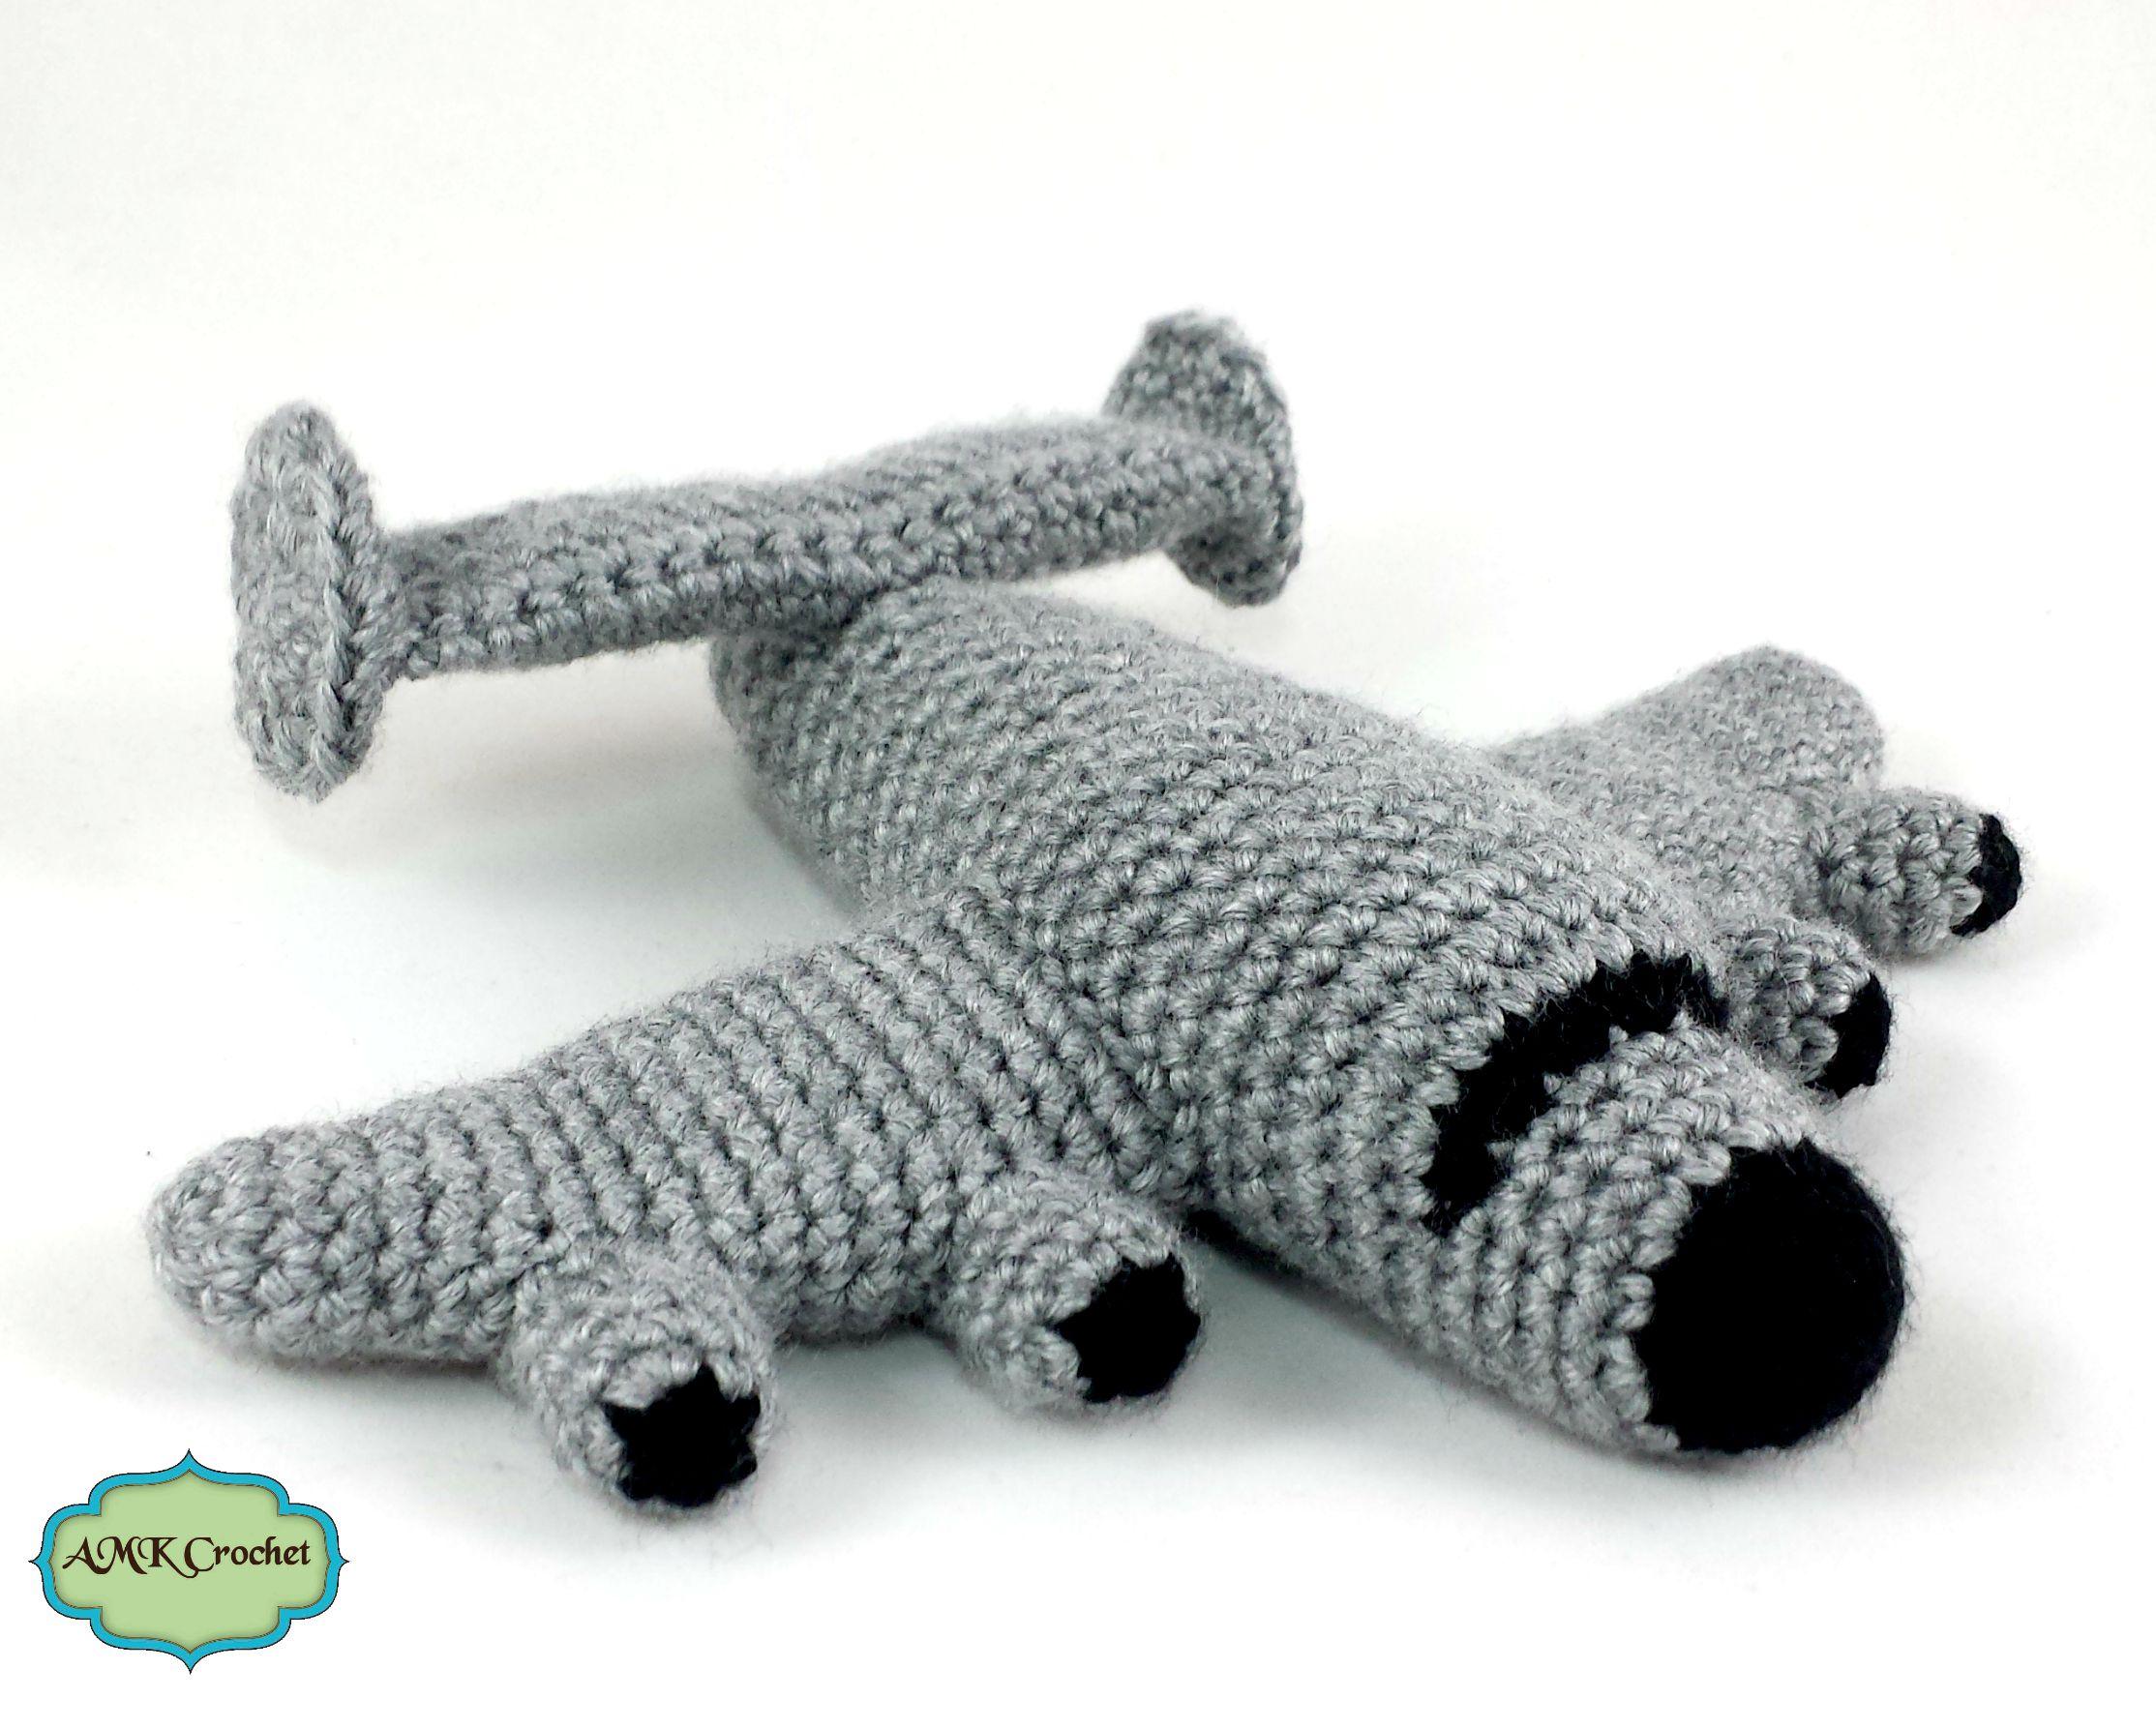 Crochet Amigurumi Airlane Plush Toy Pattern Amk Crochet